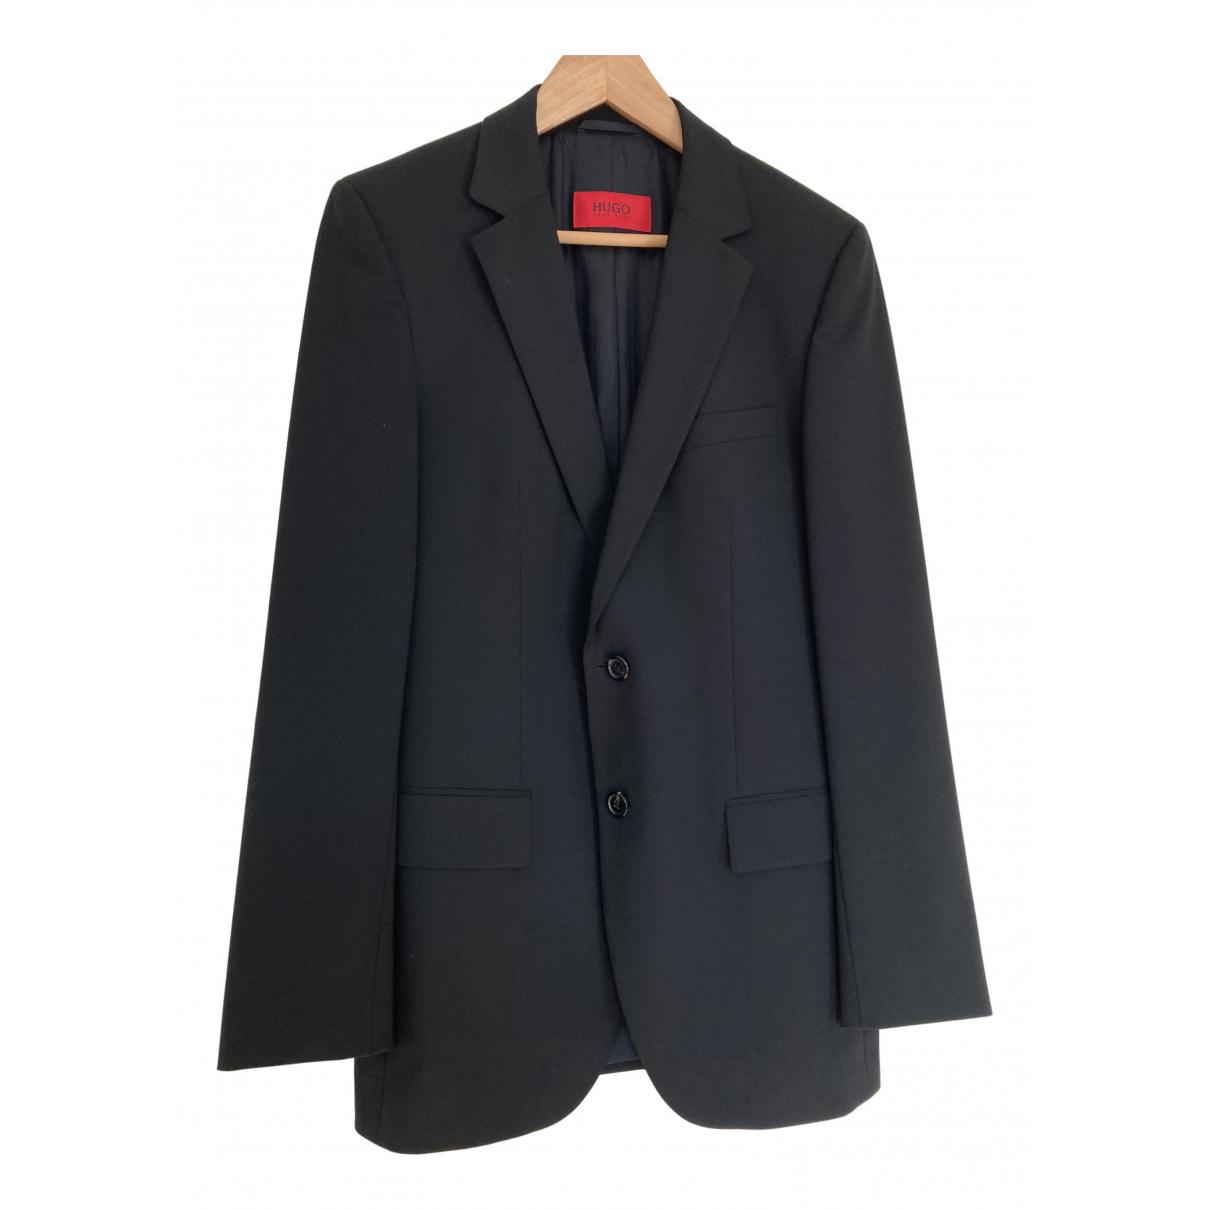 Hugo Boss N Black Wool Suits for Men S International